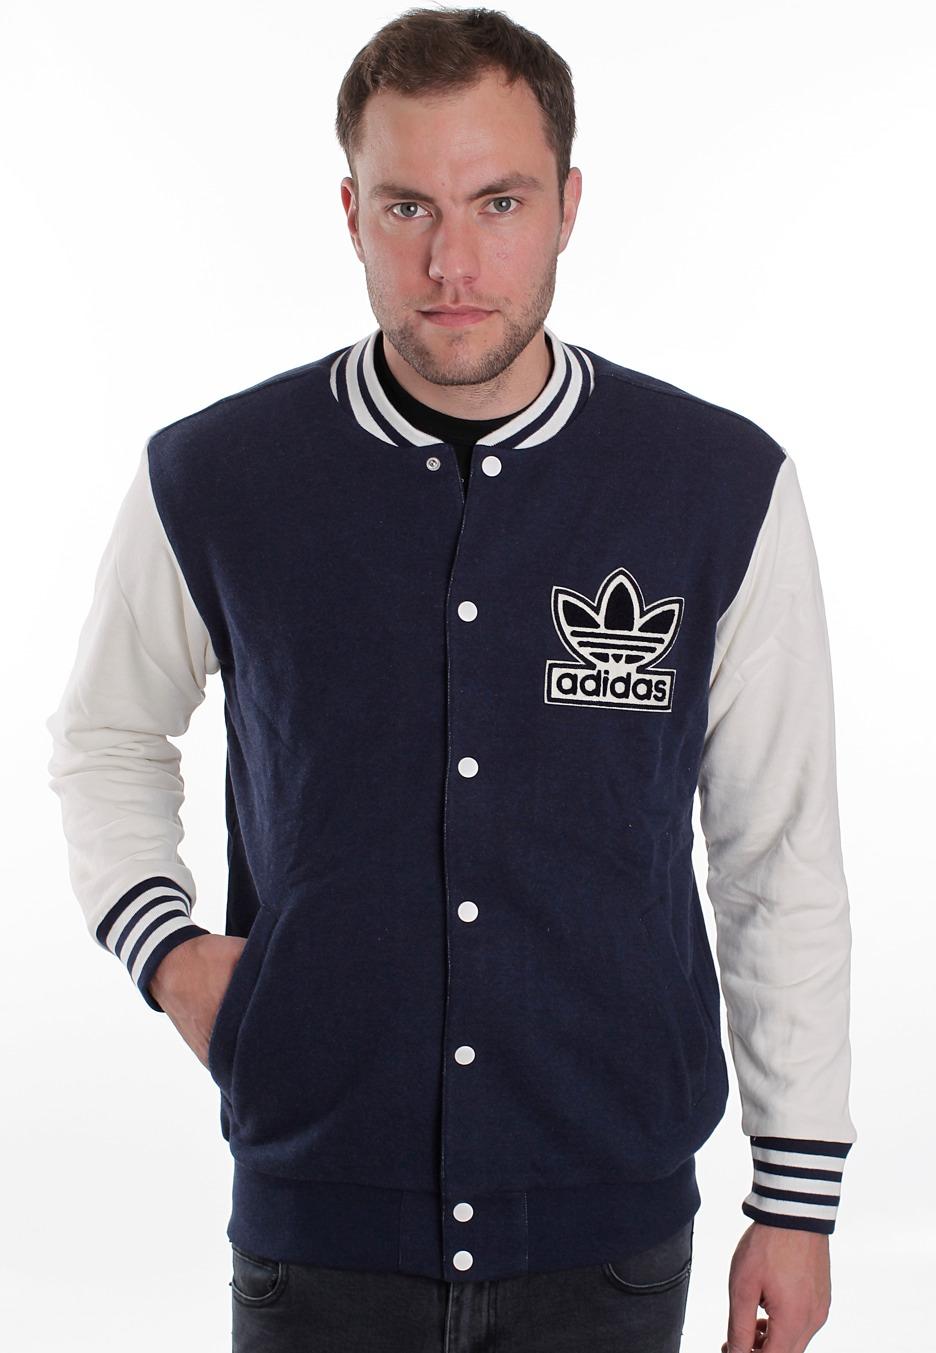 adidas_college_indigomelangecharcoal_collegejacket_lg.jpg